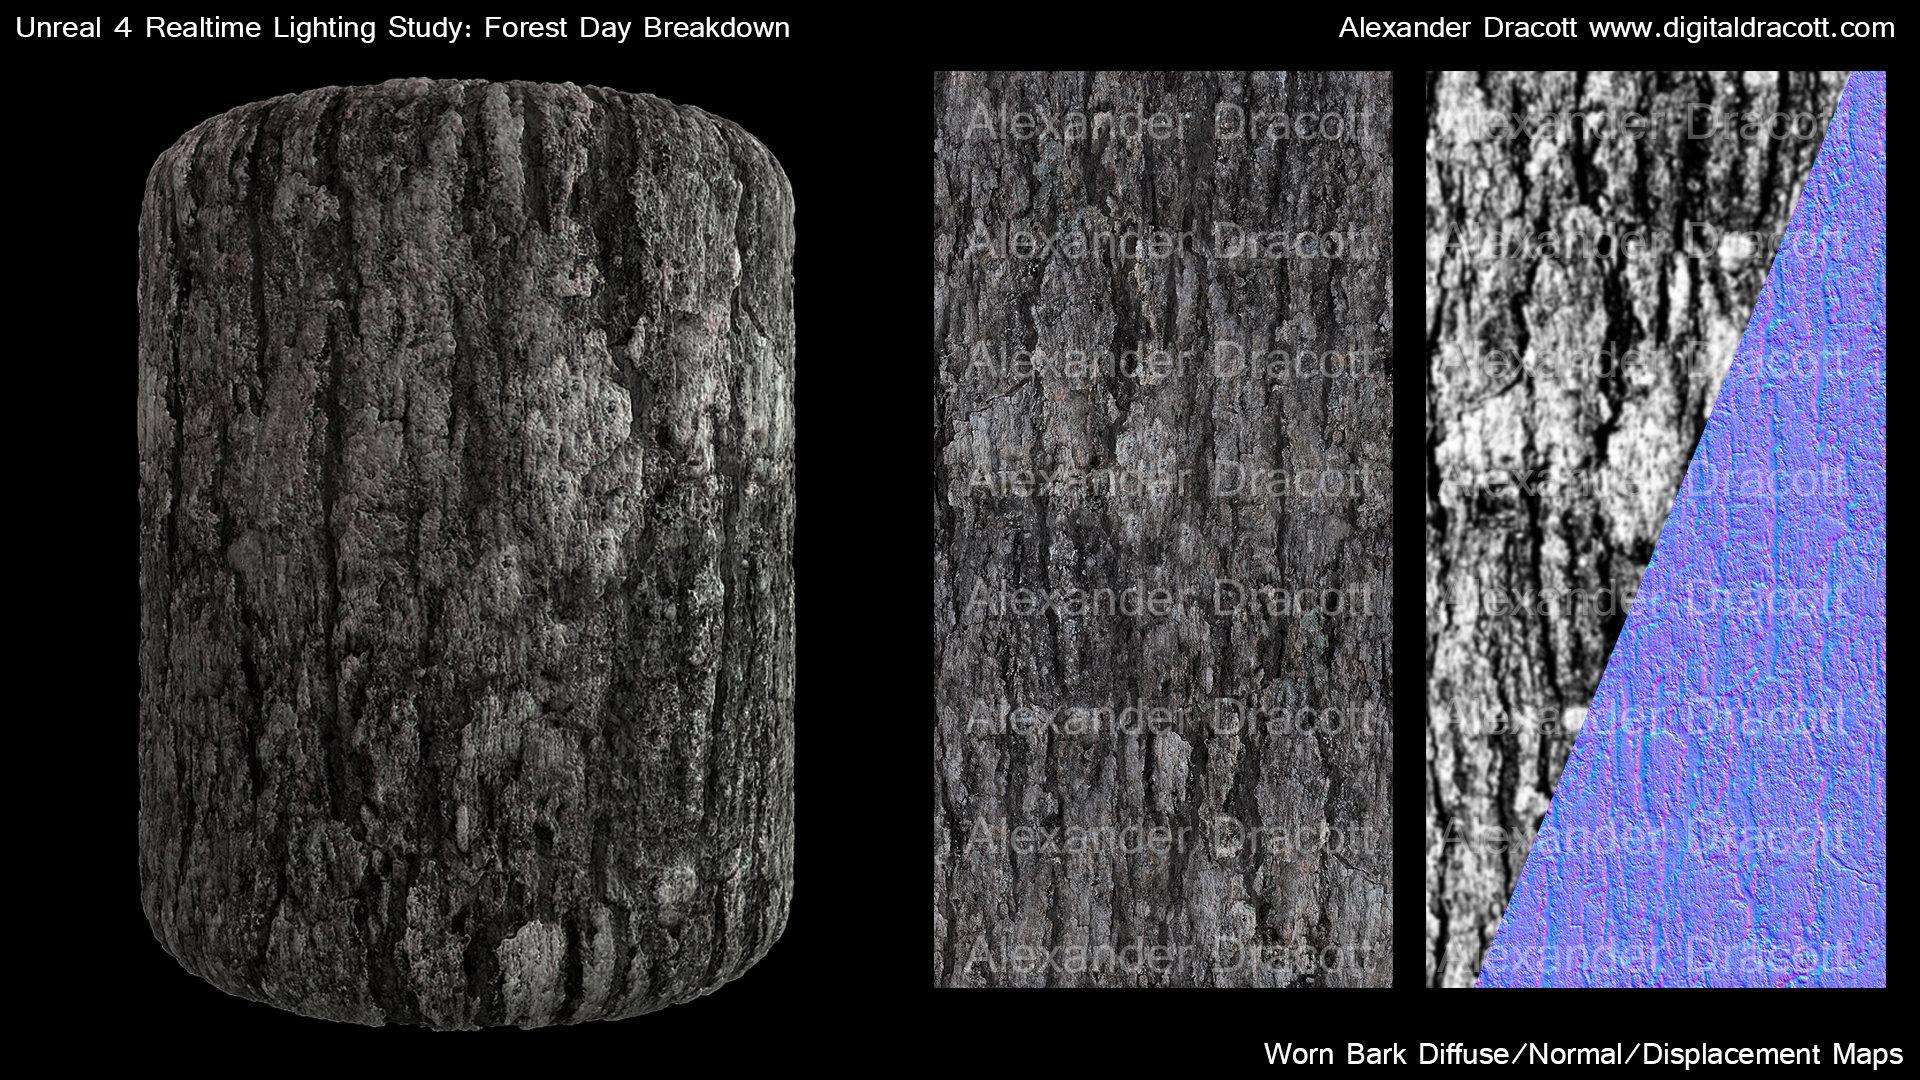 Alexander dracott forestbreakdown texturewornbark